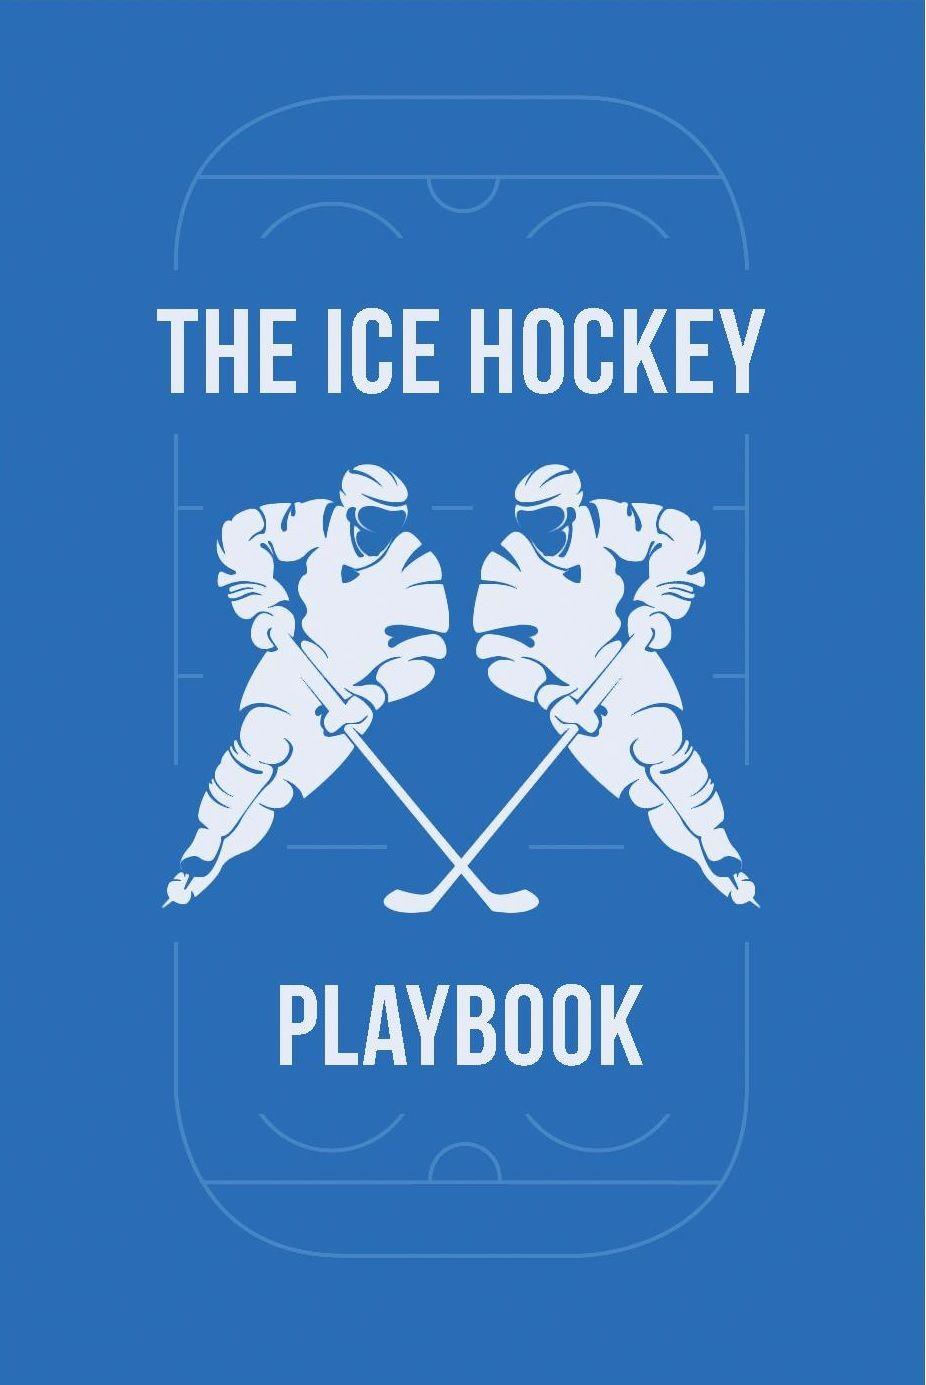 The Ice Hockey Playbook Blank Ice Hockey Rink Diagrams Blank Hockey Practice Plan Templates In 2020 Ice Hockey Rink Ice Hockey Hockey